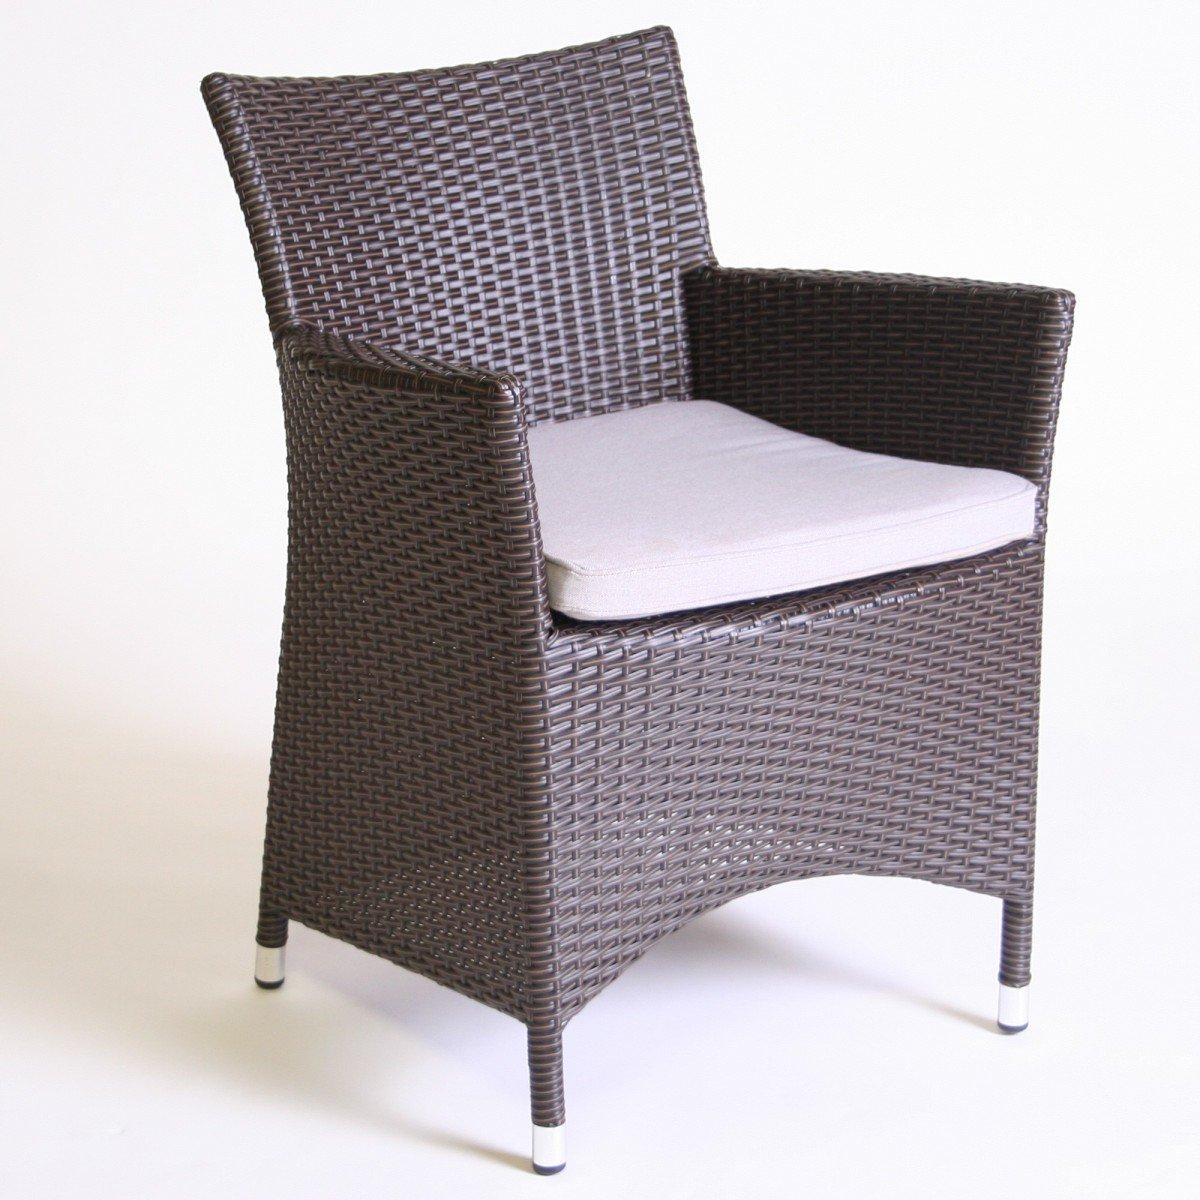 Dreams4Home Gartensessel Rattan 'Dafne' braun beige Gartenstuhl Stuhl inkl. Polster , Farbe:Braun bestellen